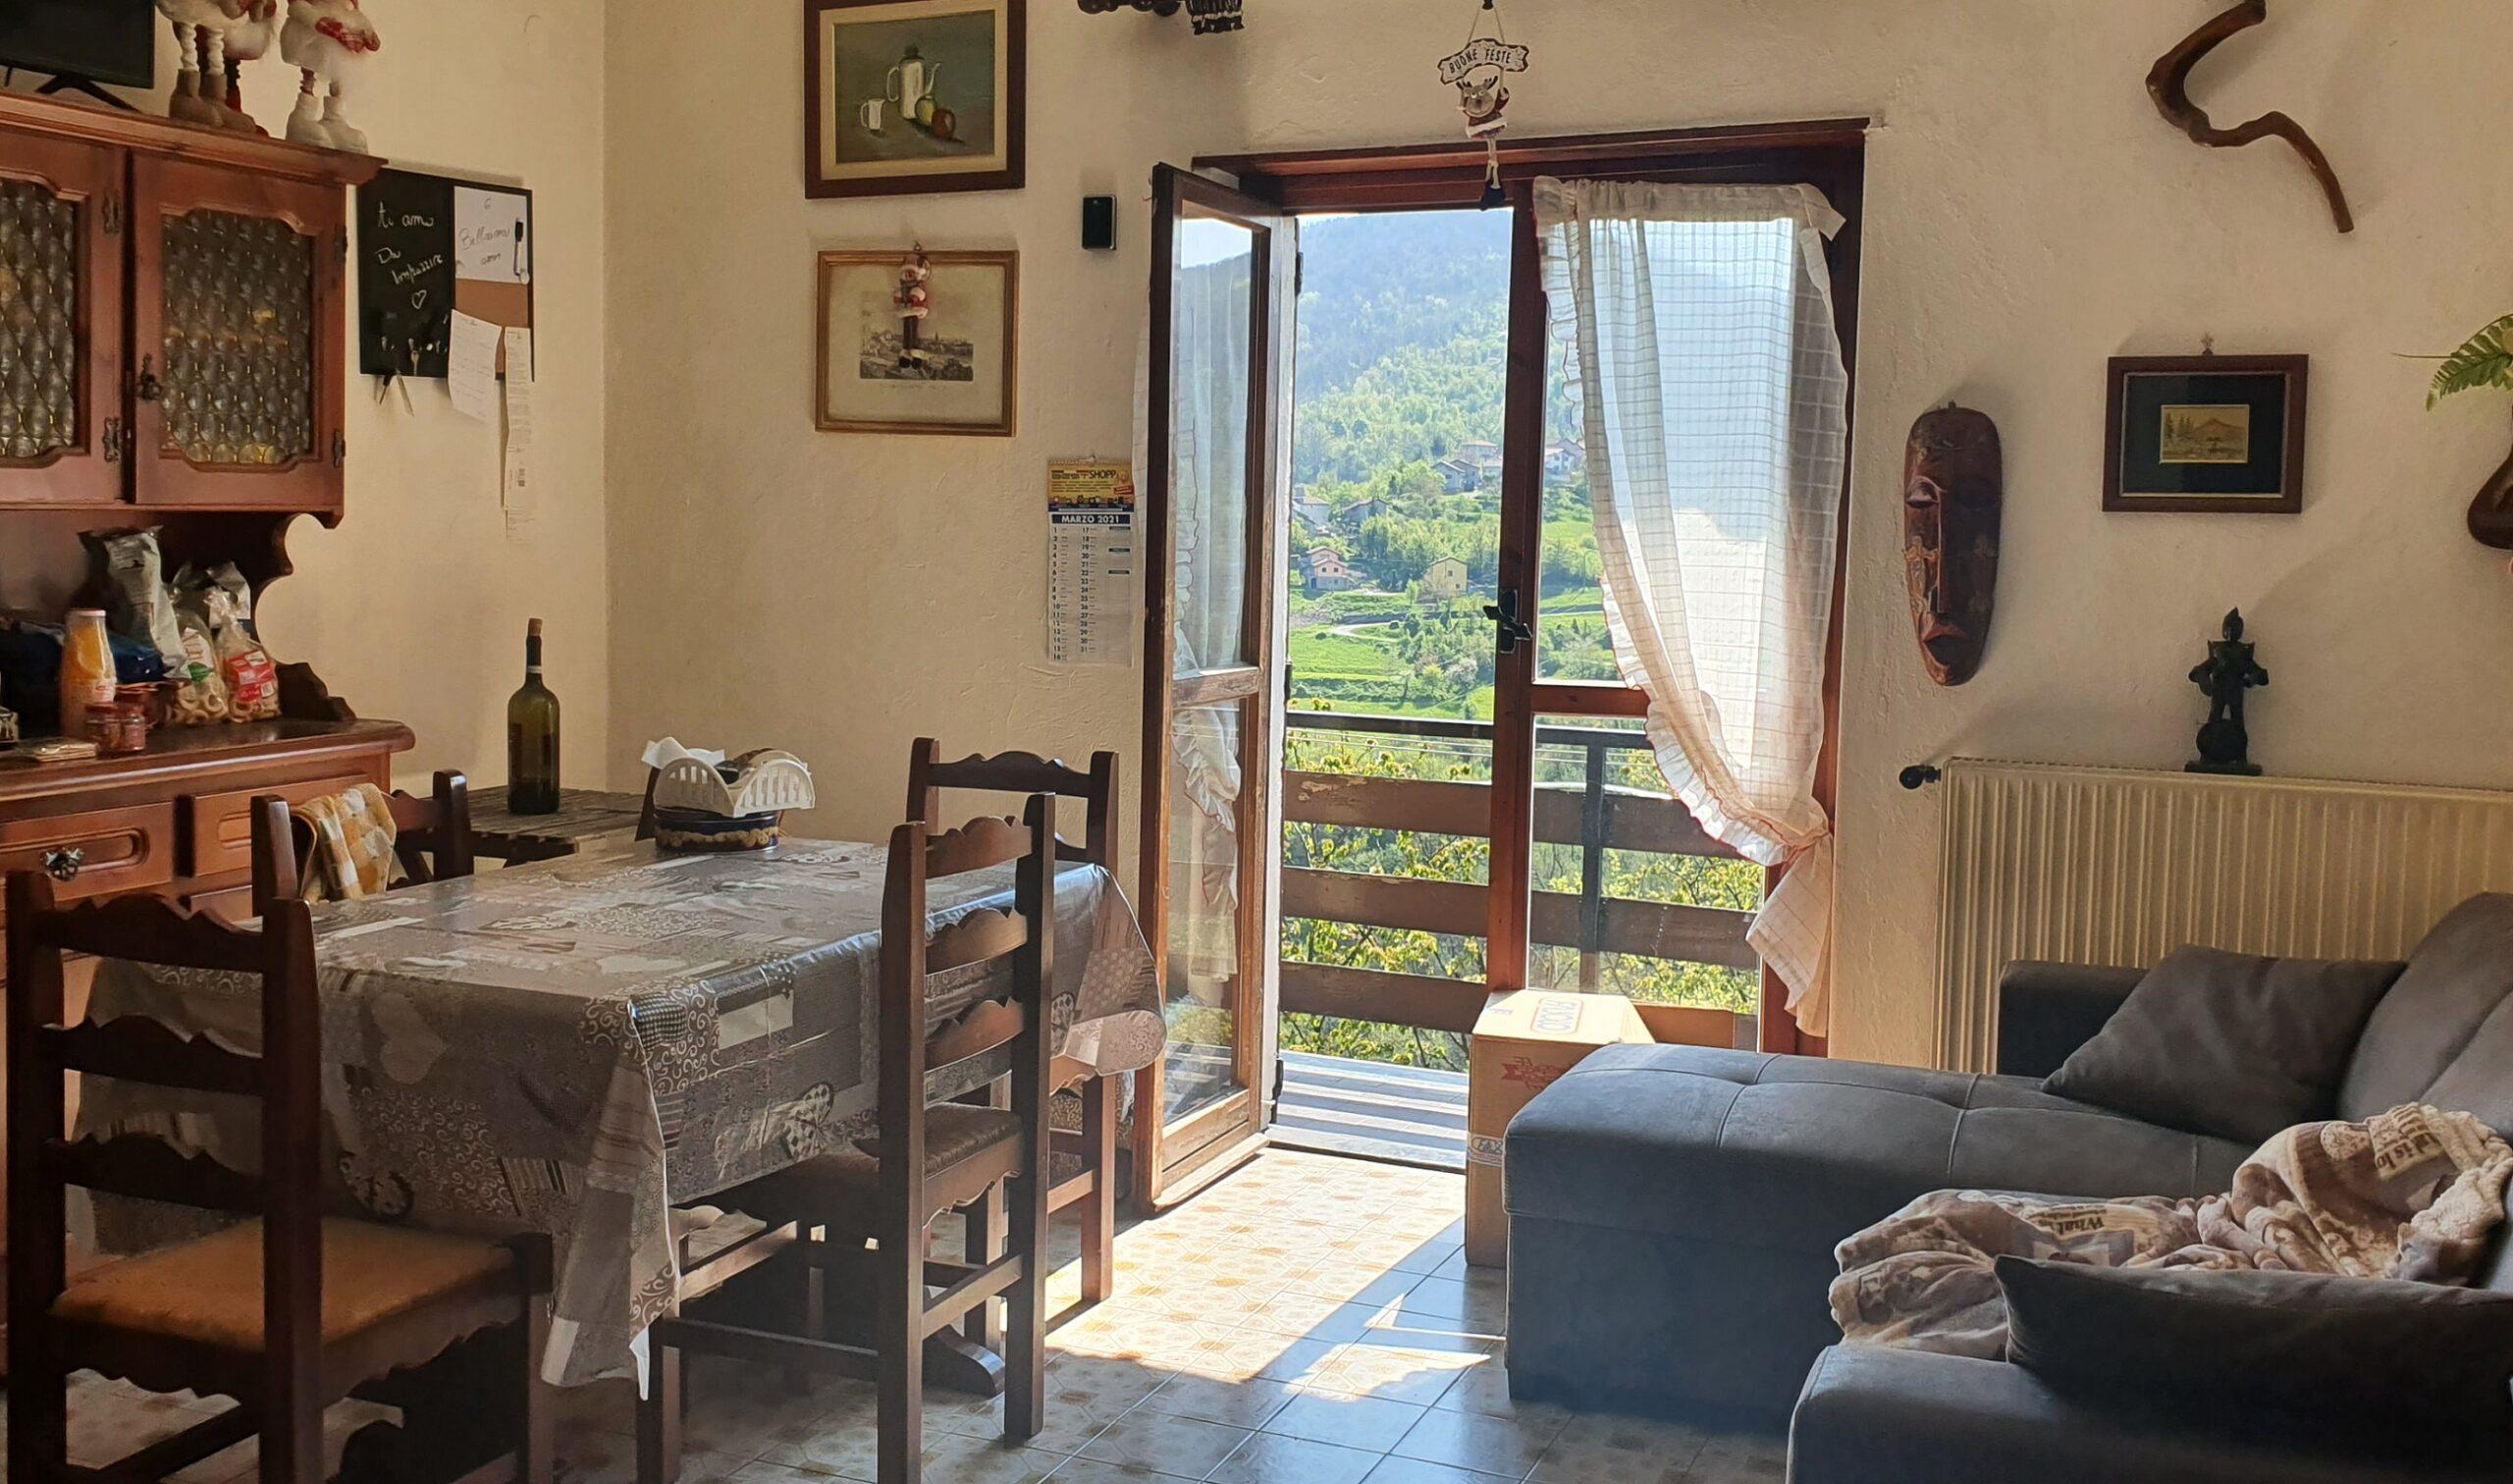 AFFITTO – Appartamento, Via A Borlasca